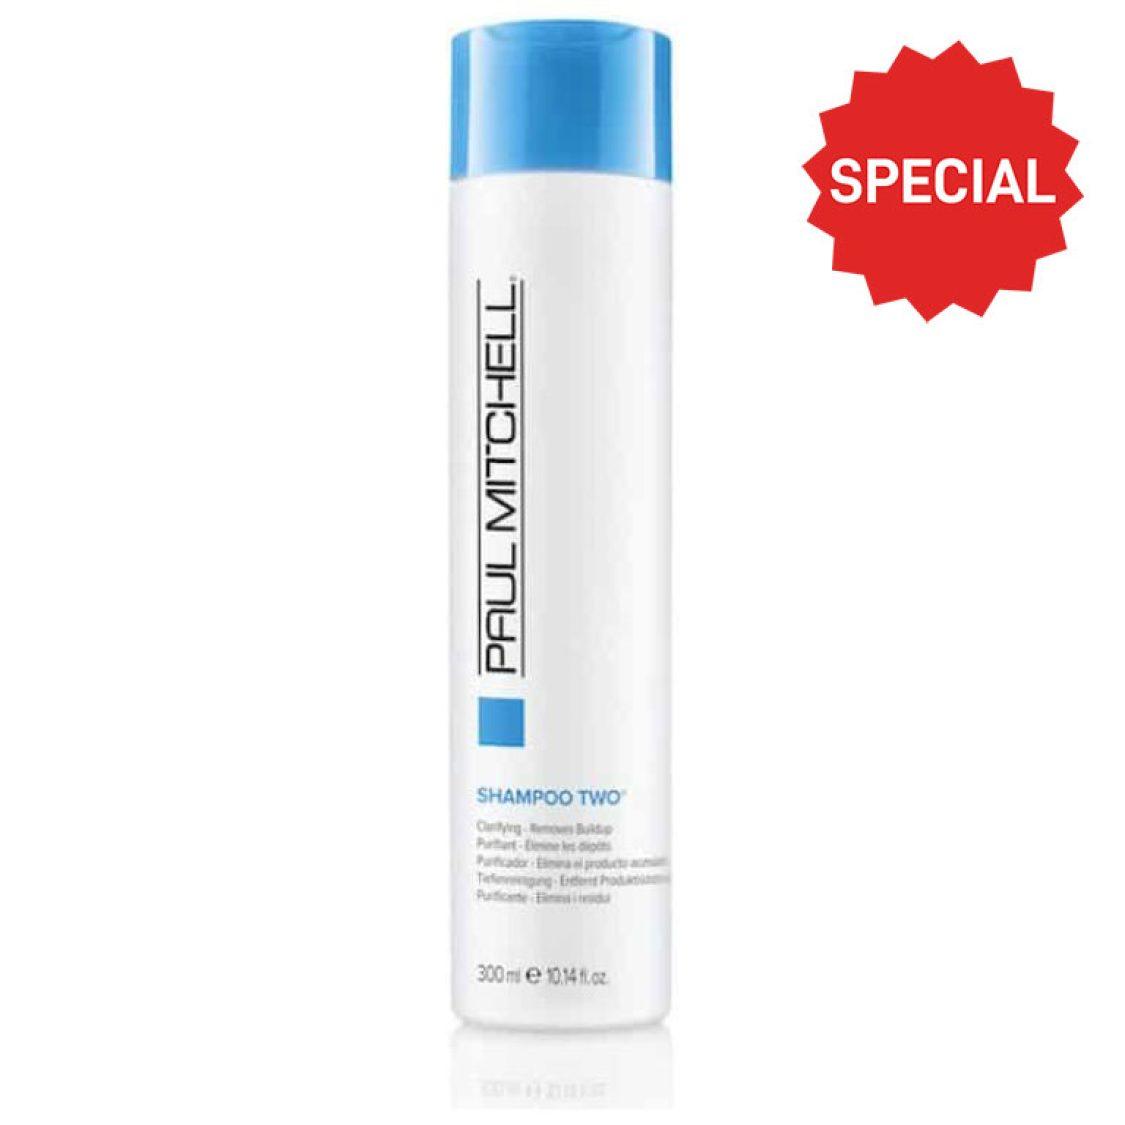 Paul Mitchell - Clarifying - Shampoo Two 300ml